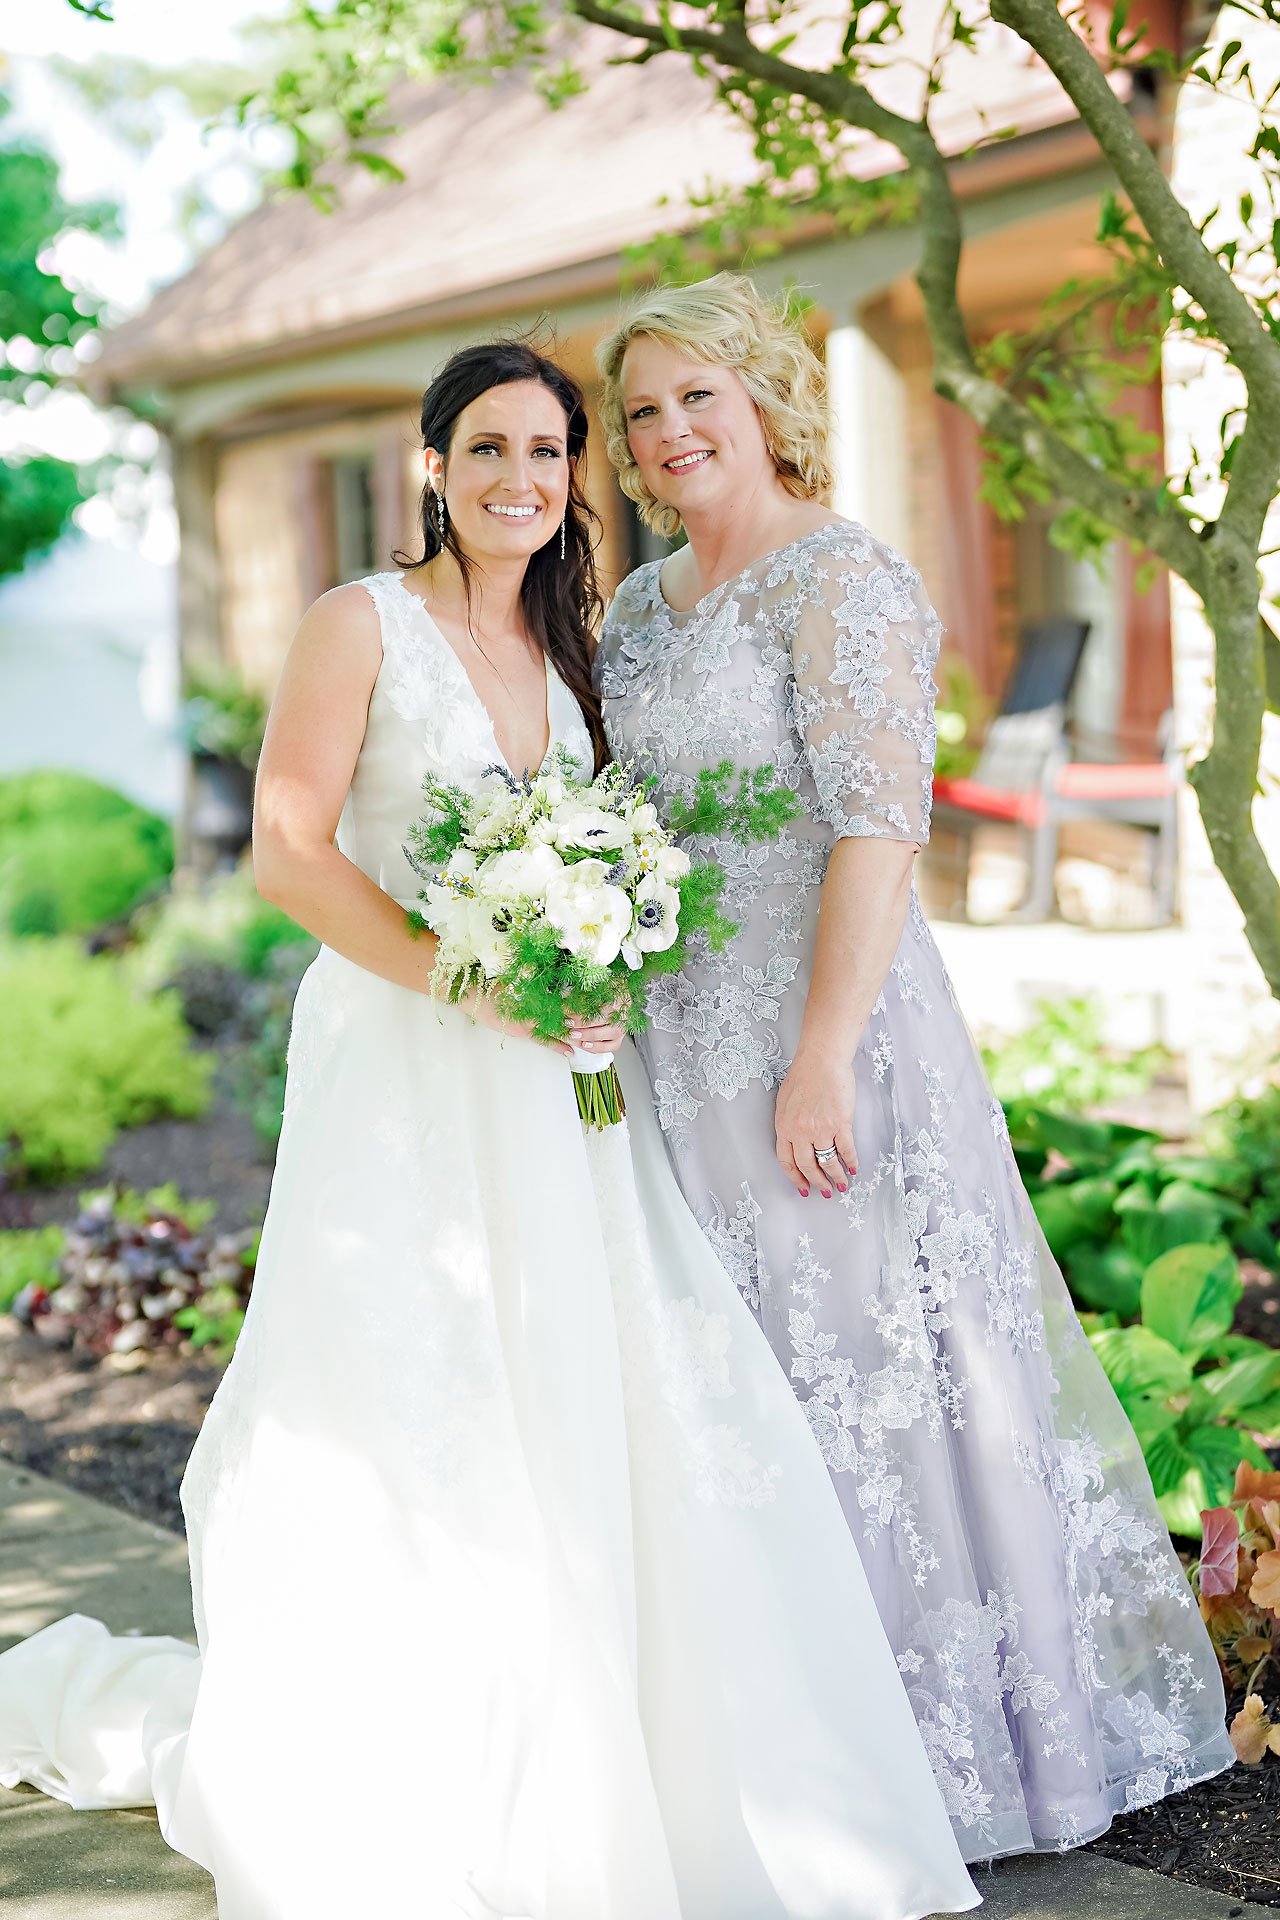 MacKinze John Lafayette Indiana Purdue Wedding 138